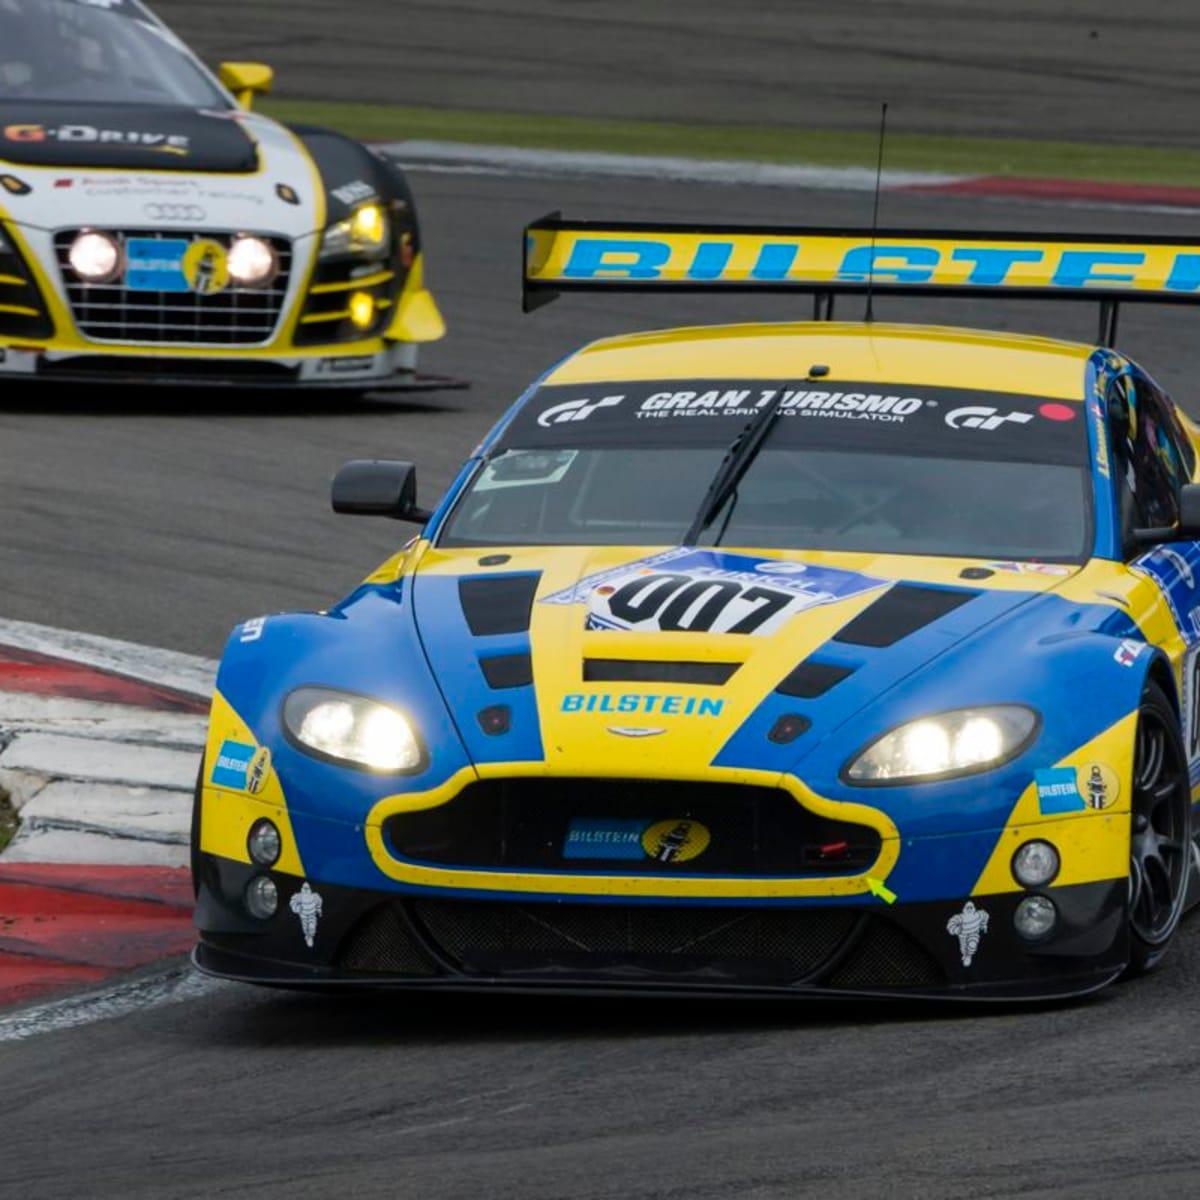 Aston Martin V12 Vantage Gt3 Leading Nurburgring 24 Hours Caradvice